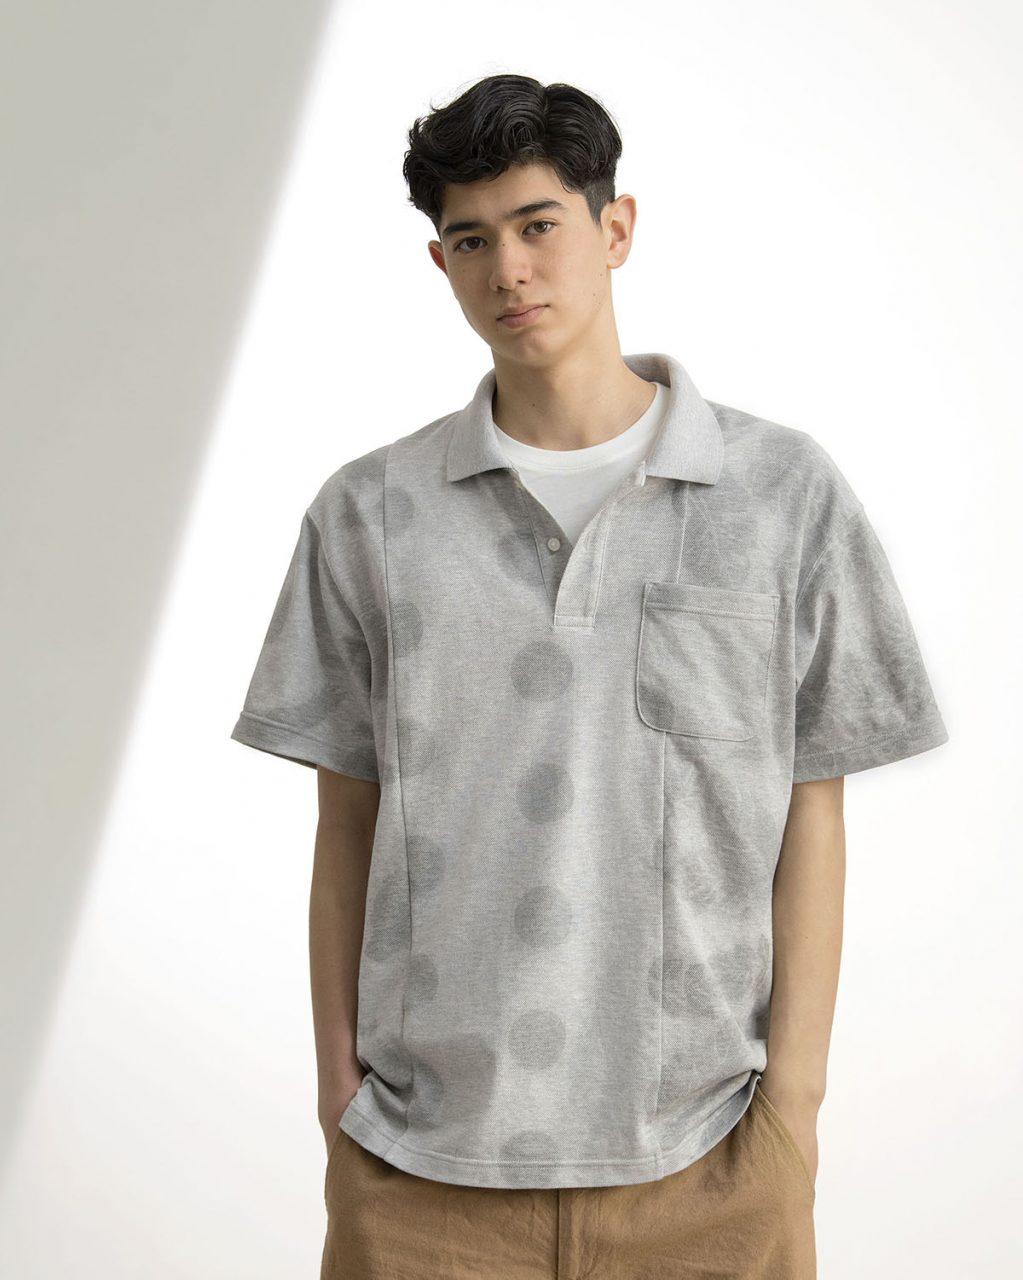 Uniqlo x Engineered Garments